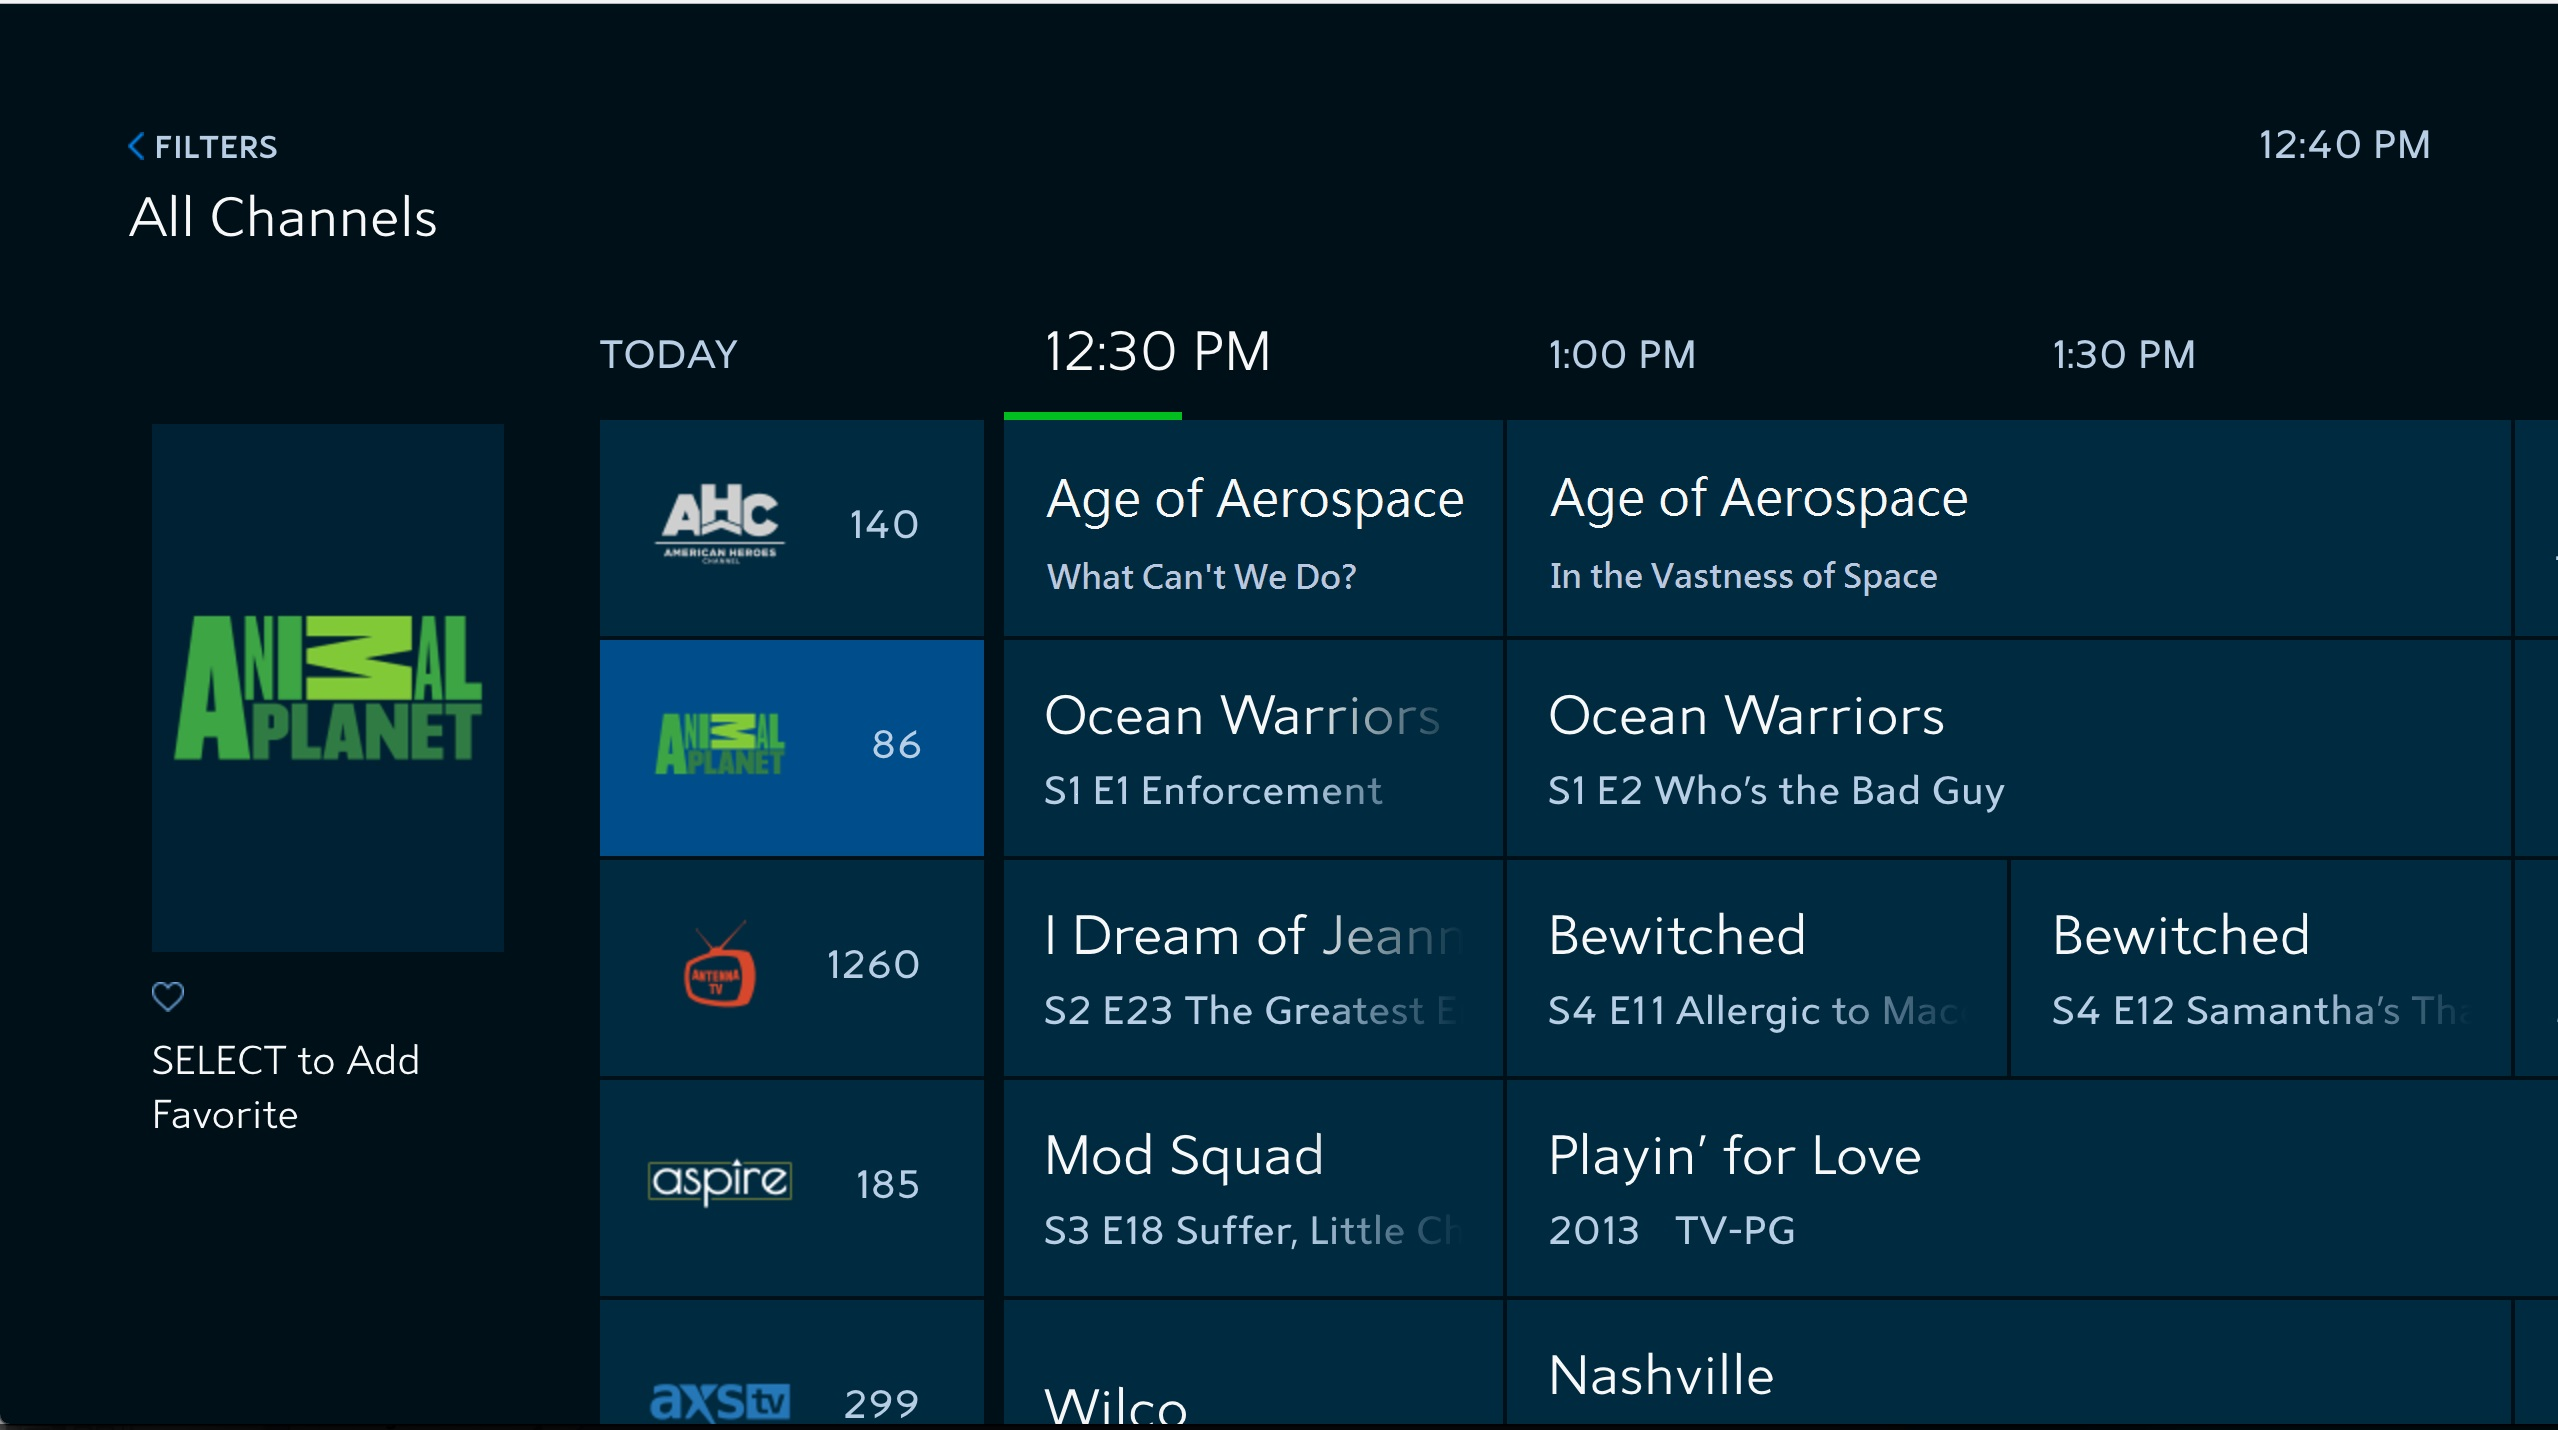 Guide screen of the Spectrum TV app for Samsung Smart TVs